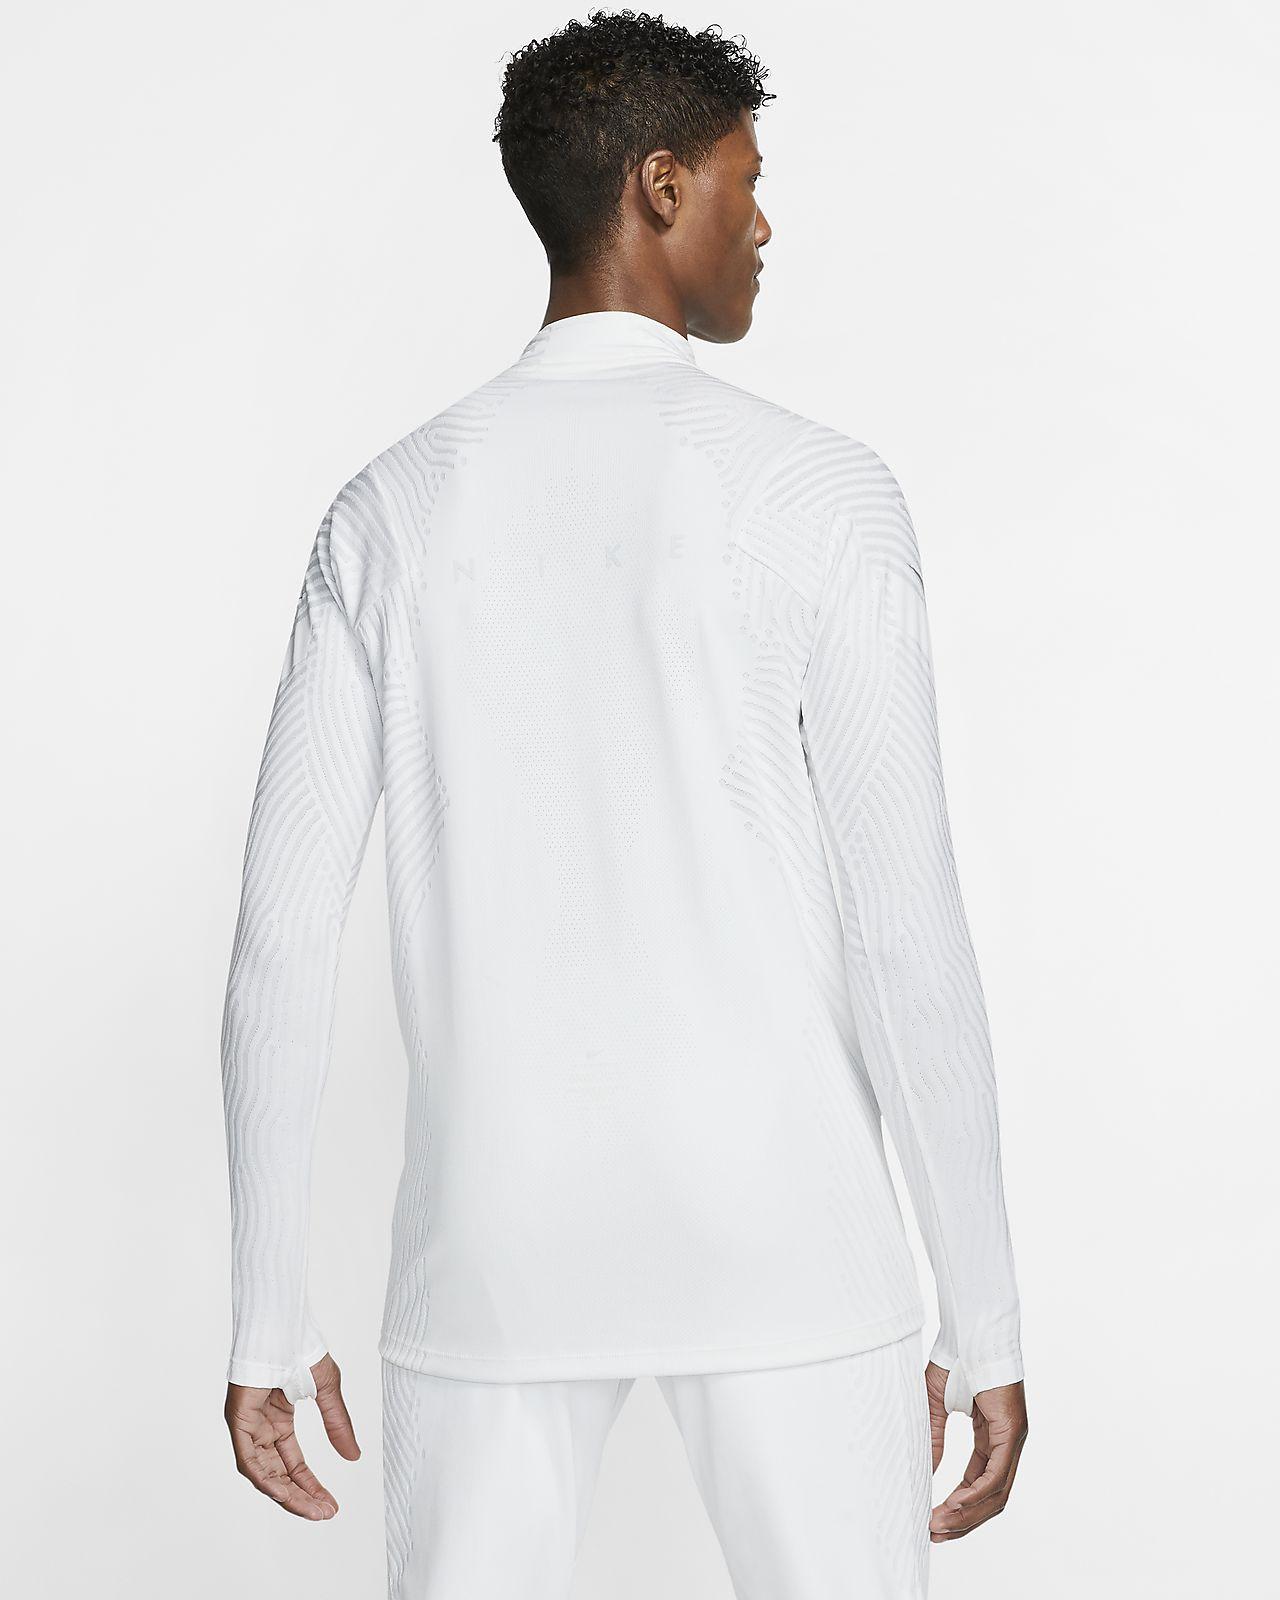 T Shirt Nike Vapor Knit Strike Dril Top CD0560 100